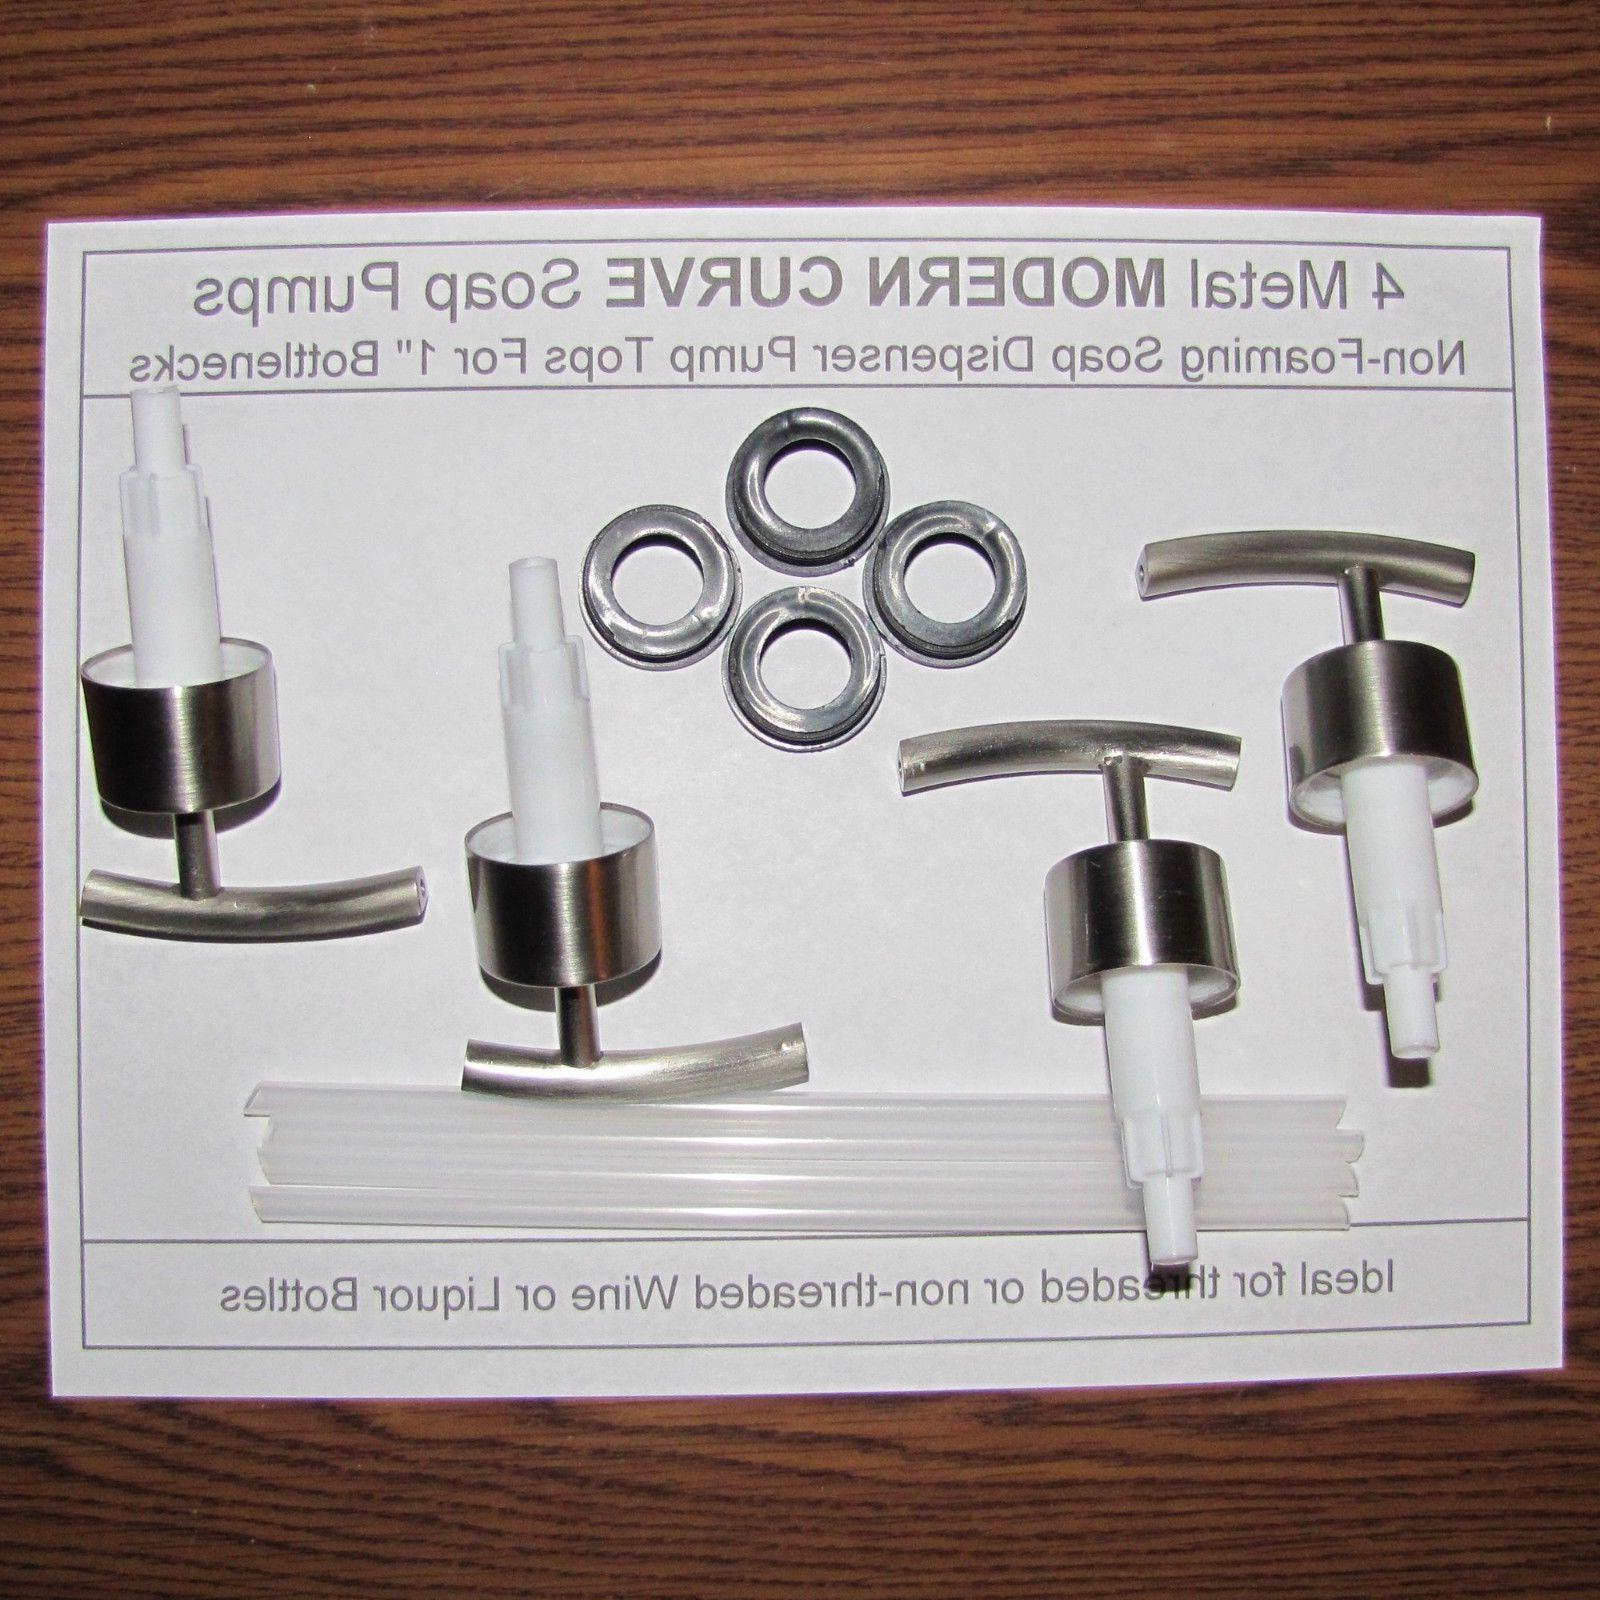 4 Soap Dispenser Pump Replacement Tops for Wine or Liquor Bo